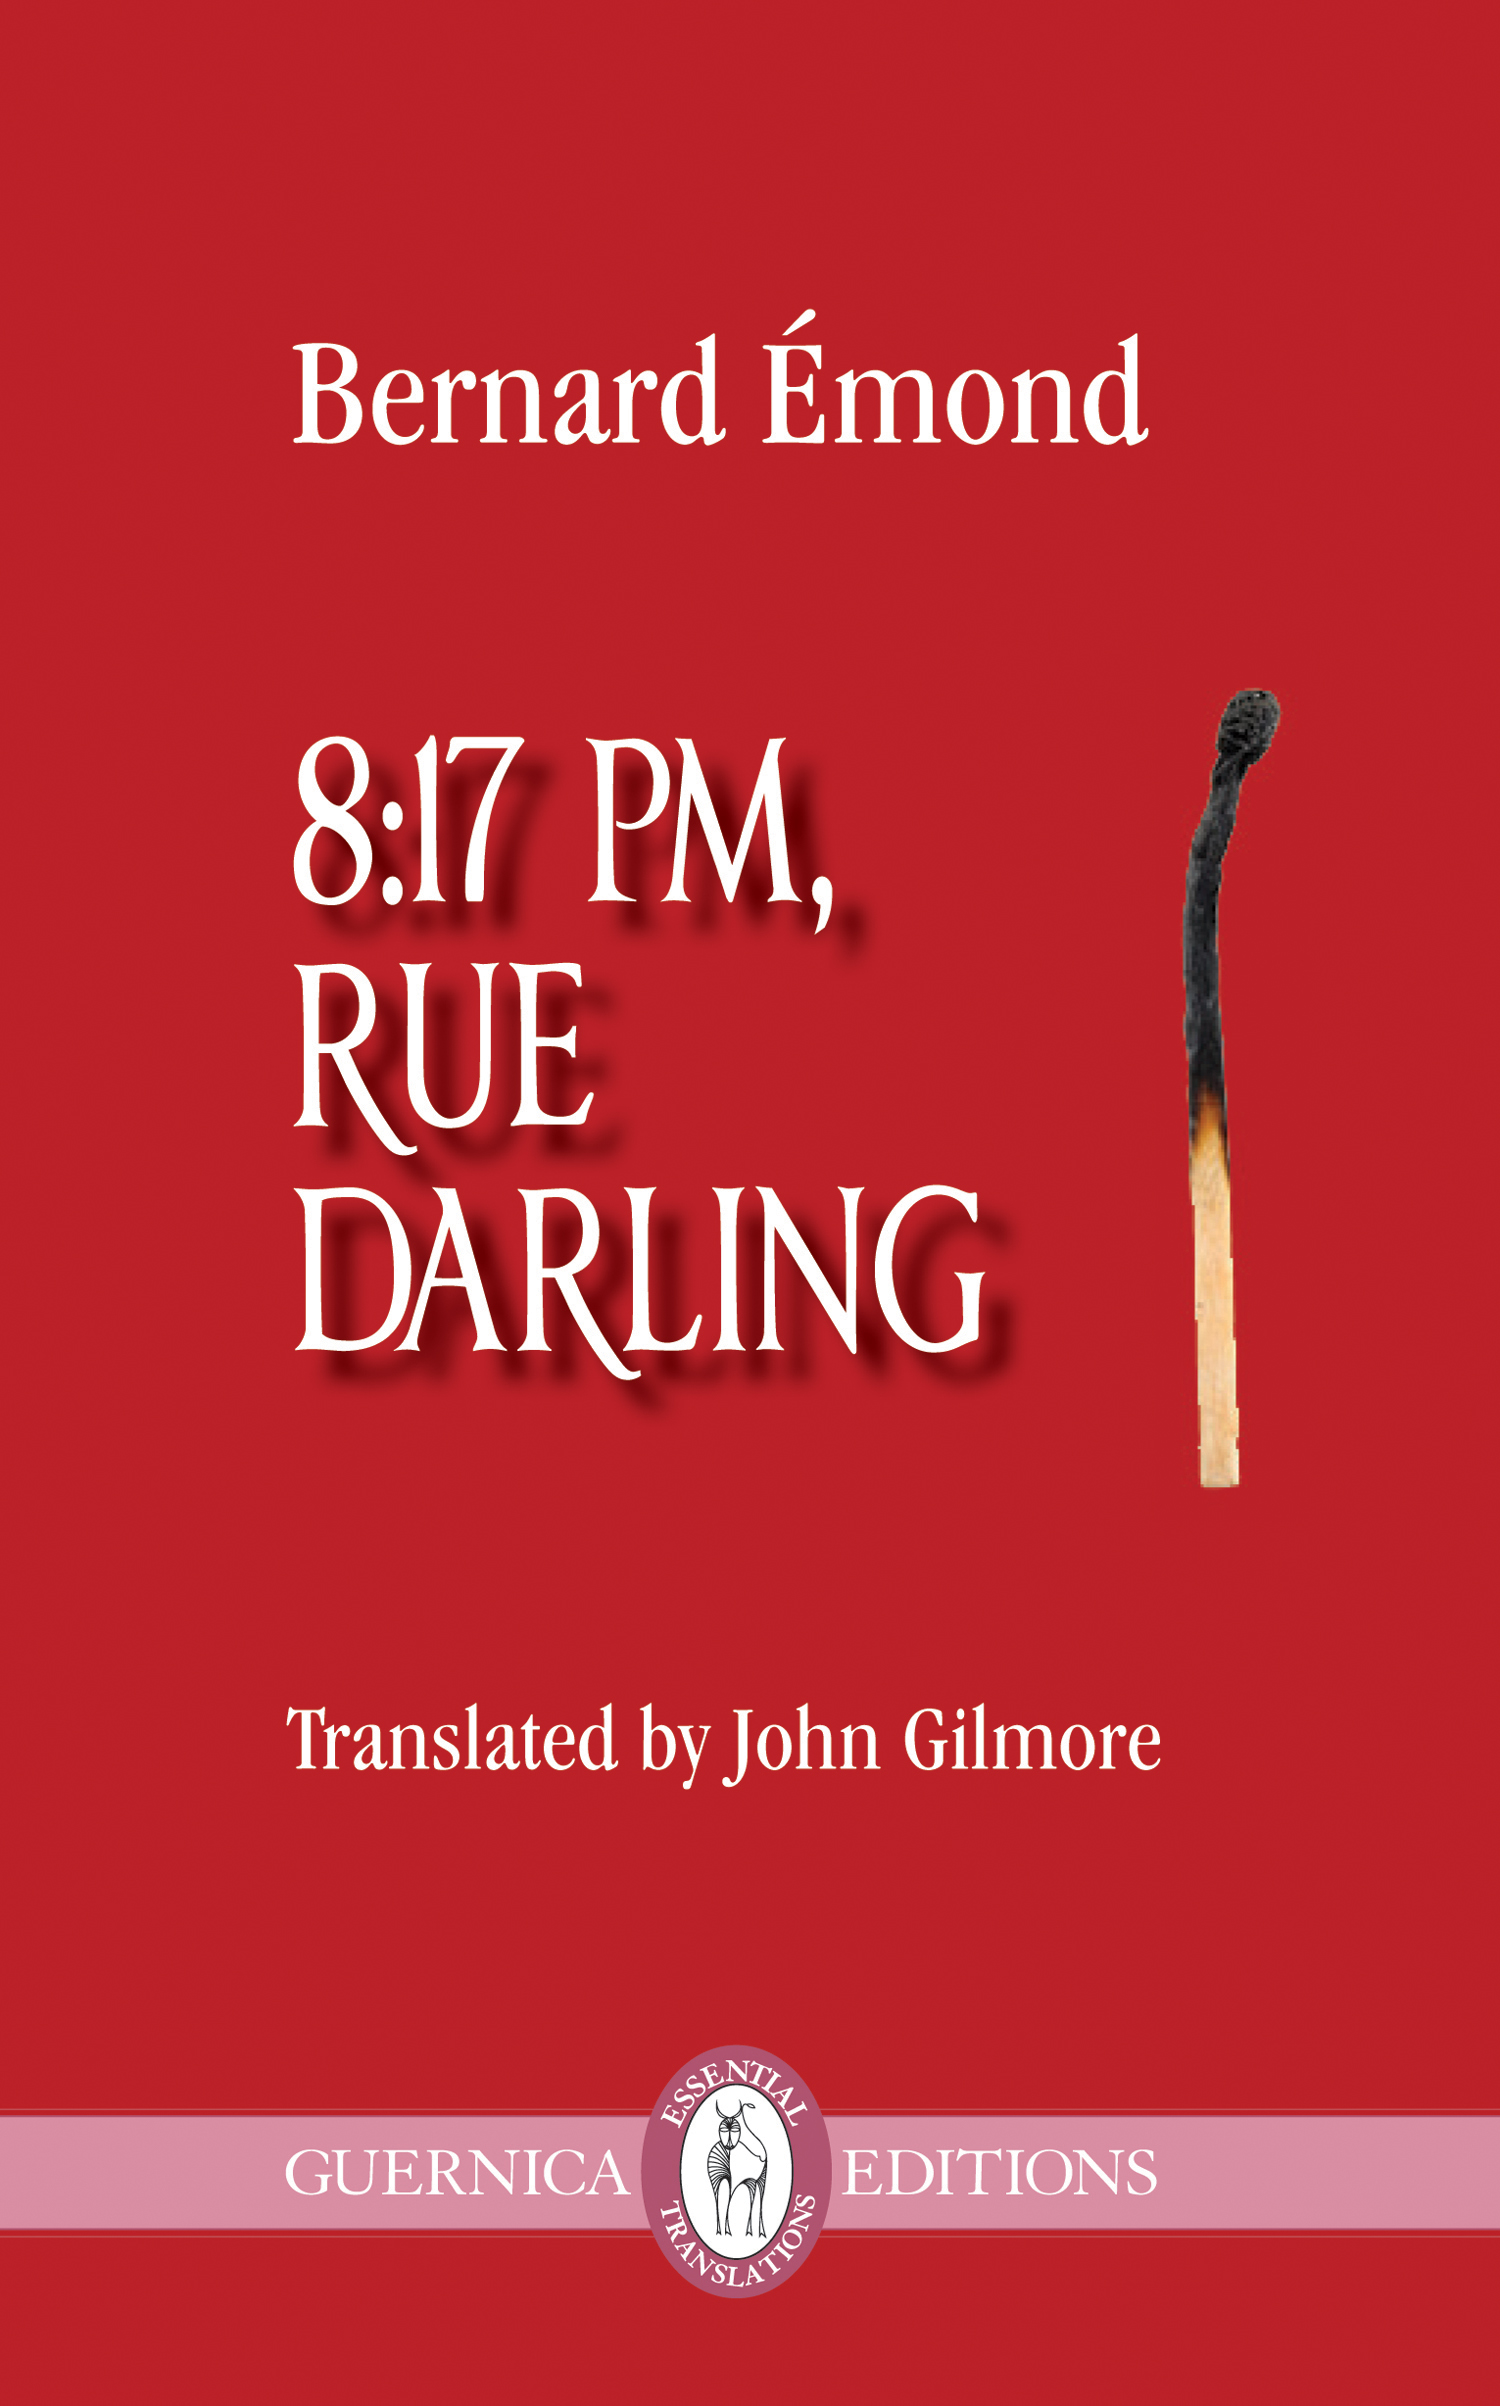 8:17 pm rue Darling